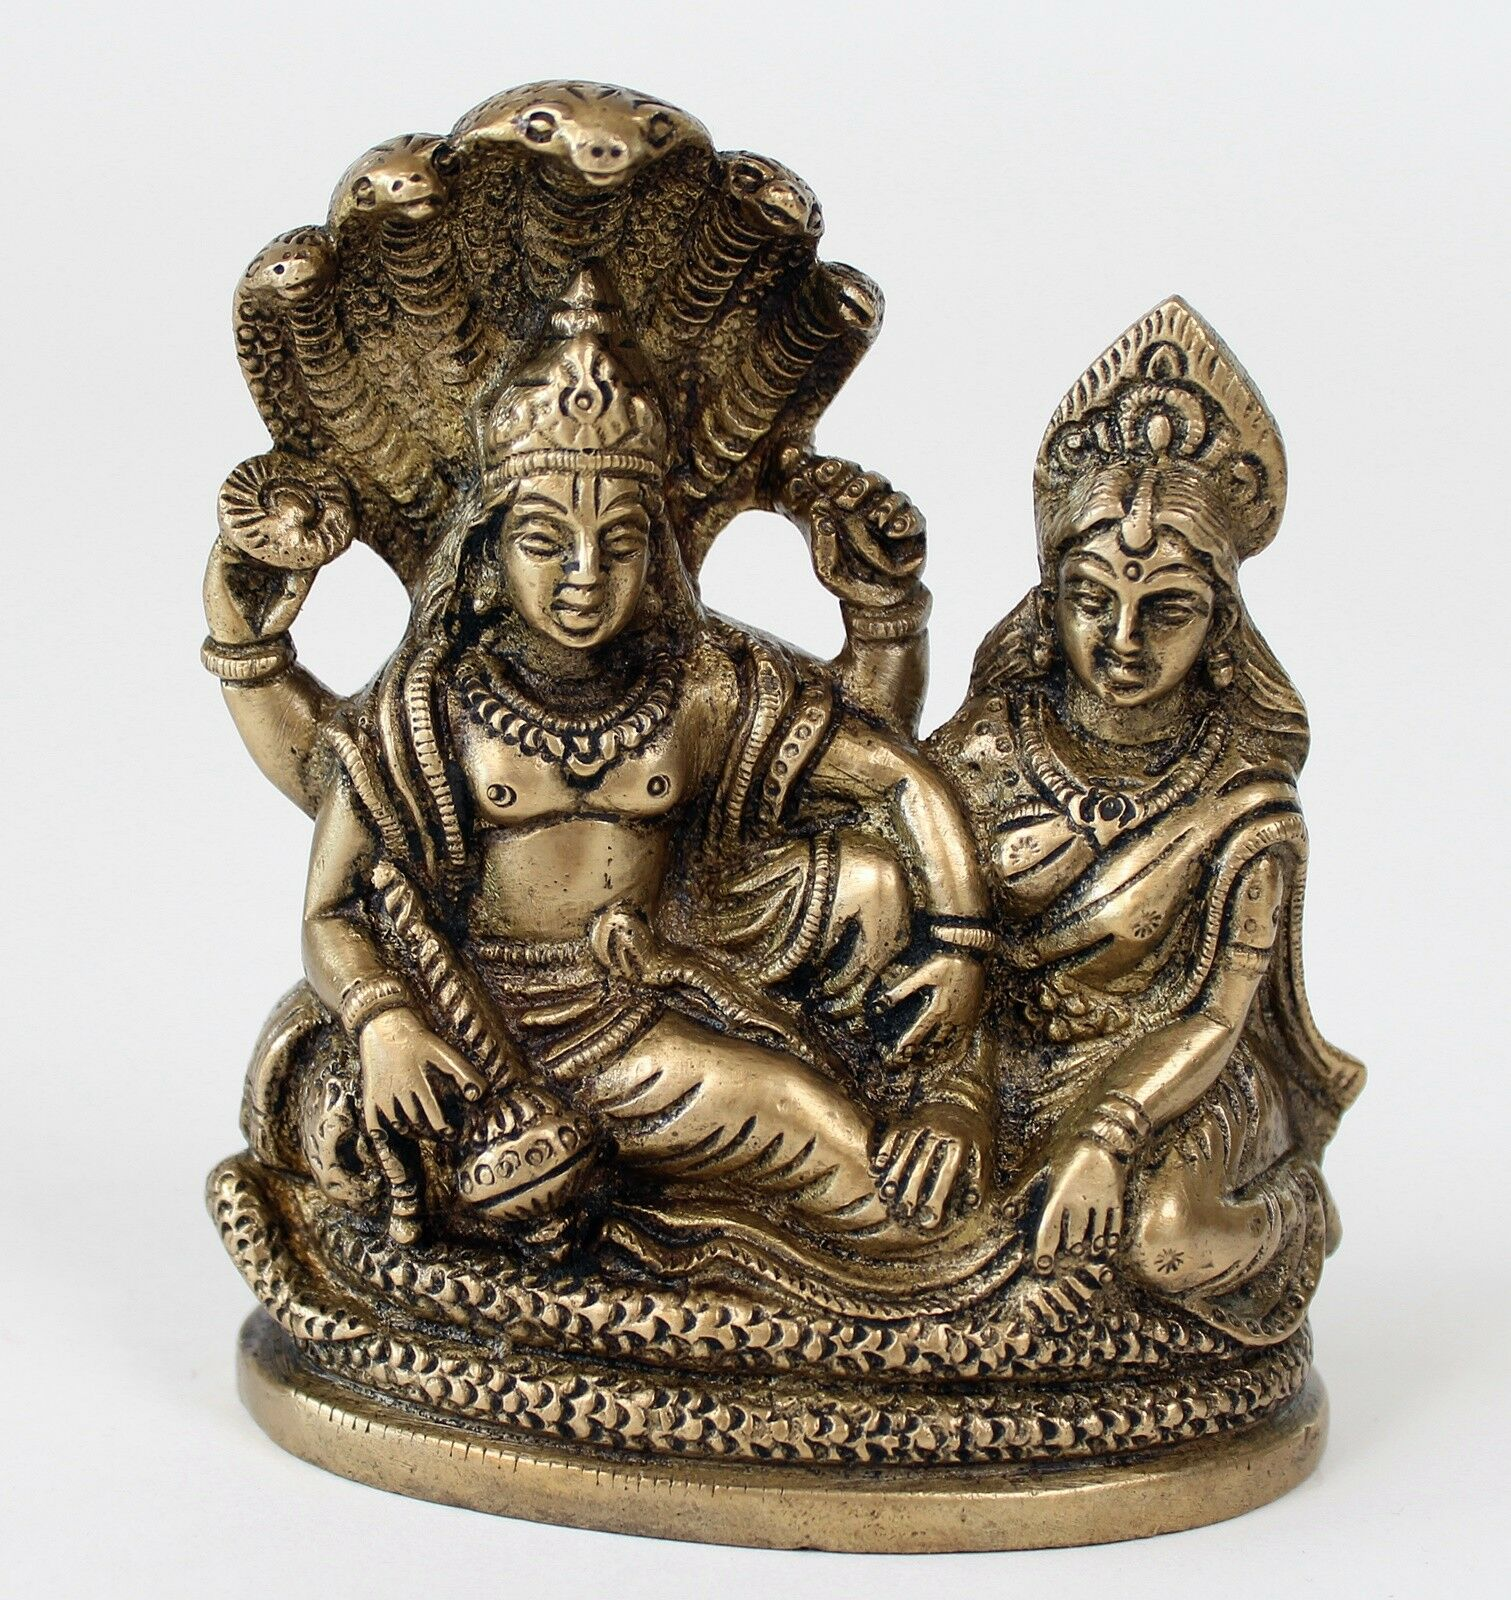 Laxmi sottili e Visnù statua 11 cm di altezza Himalaya BUDDHA YOGA MEDITAZIONE 0,8 kg